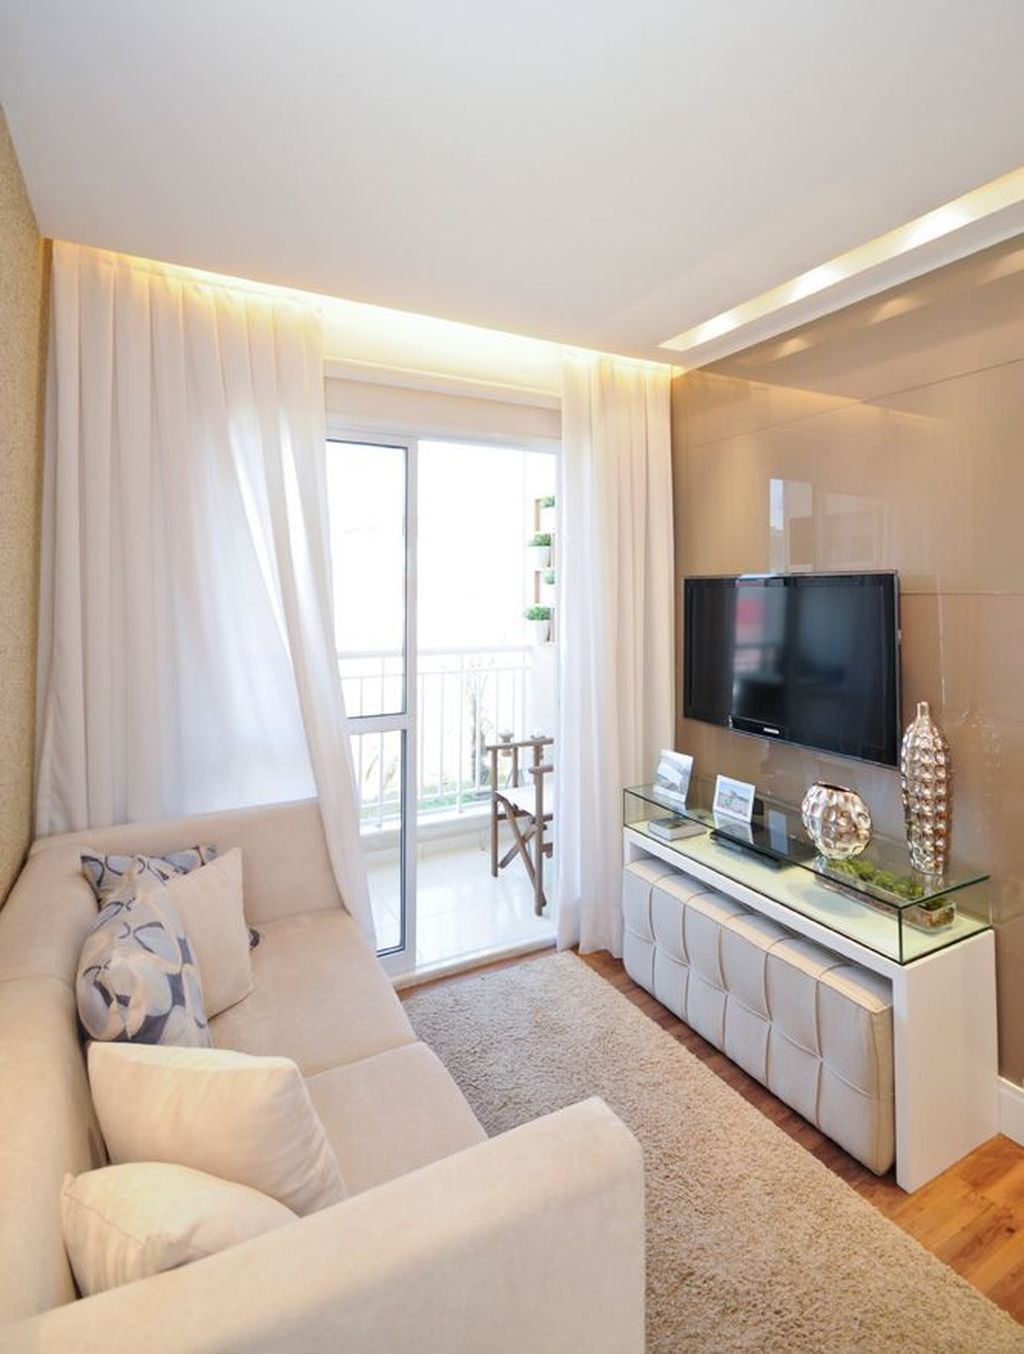 46 Fresh And Cool Small Living Room Decoration Ideas Huiskamerideeen Woonkamerdesign Woonkamer Ideeen